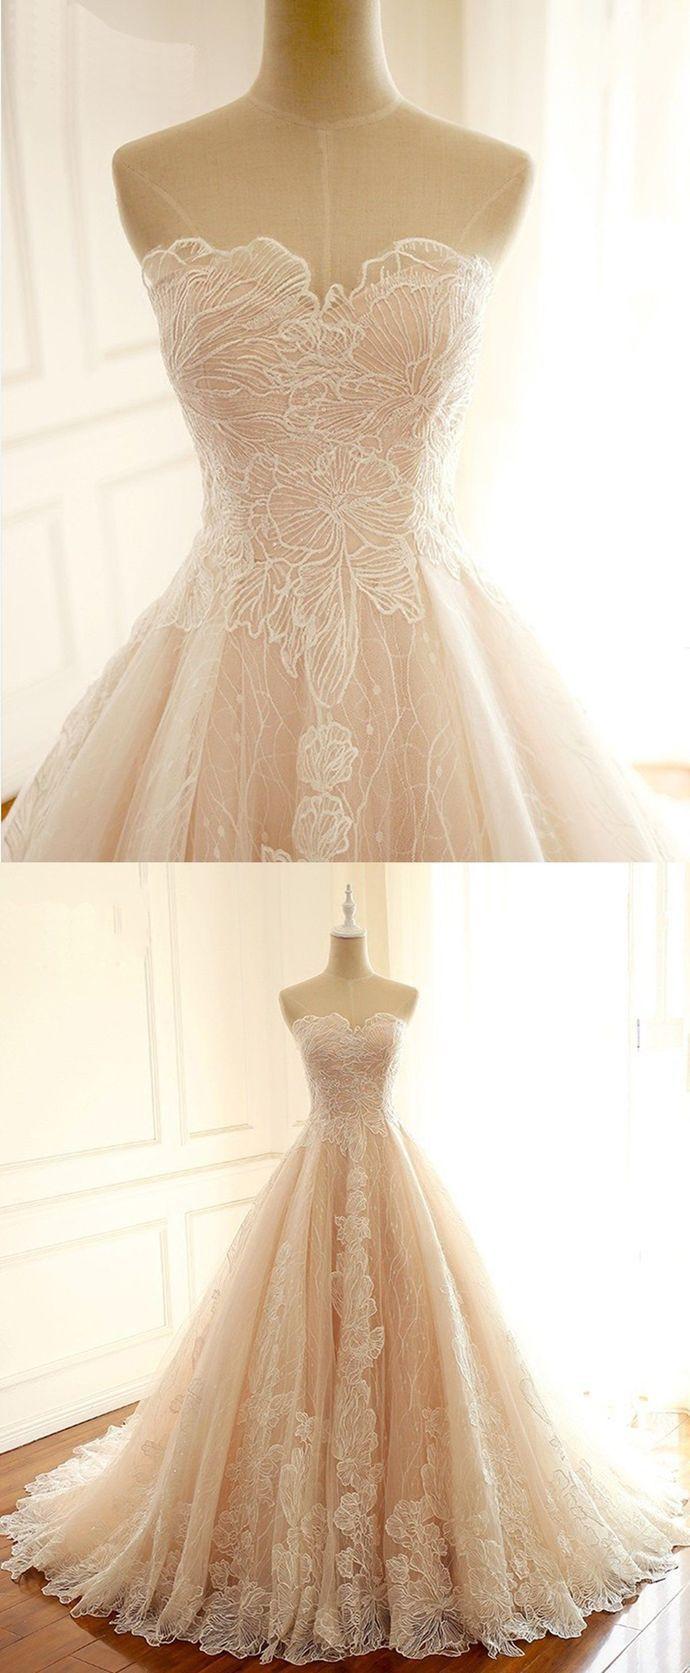 Photo of SSR0121,light champagne sleeveless strapless v-neck full length women dress applique tulle lace long school event dress sweet 16 dress